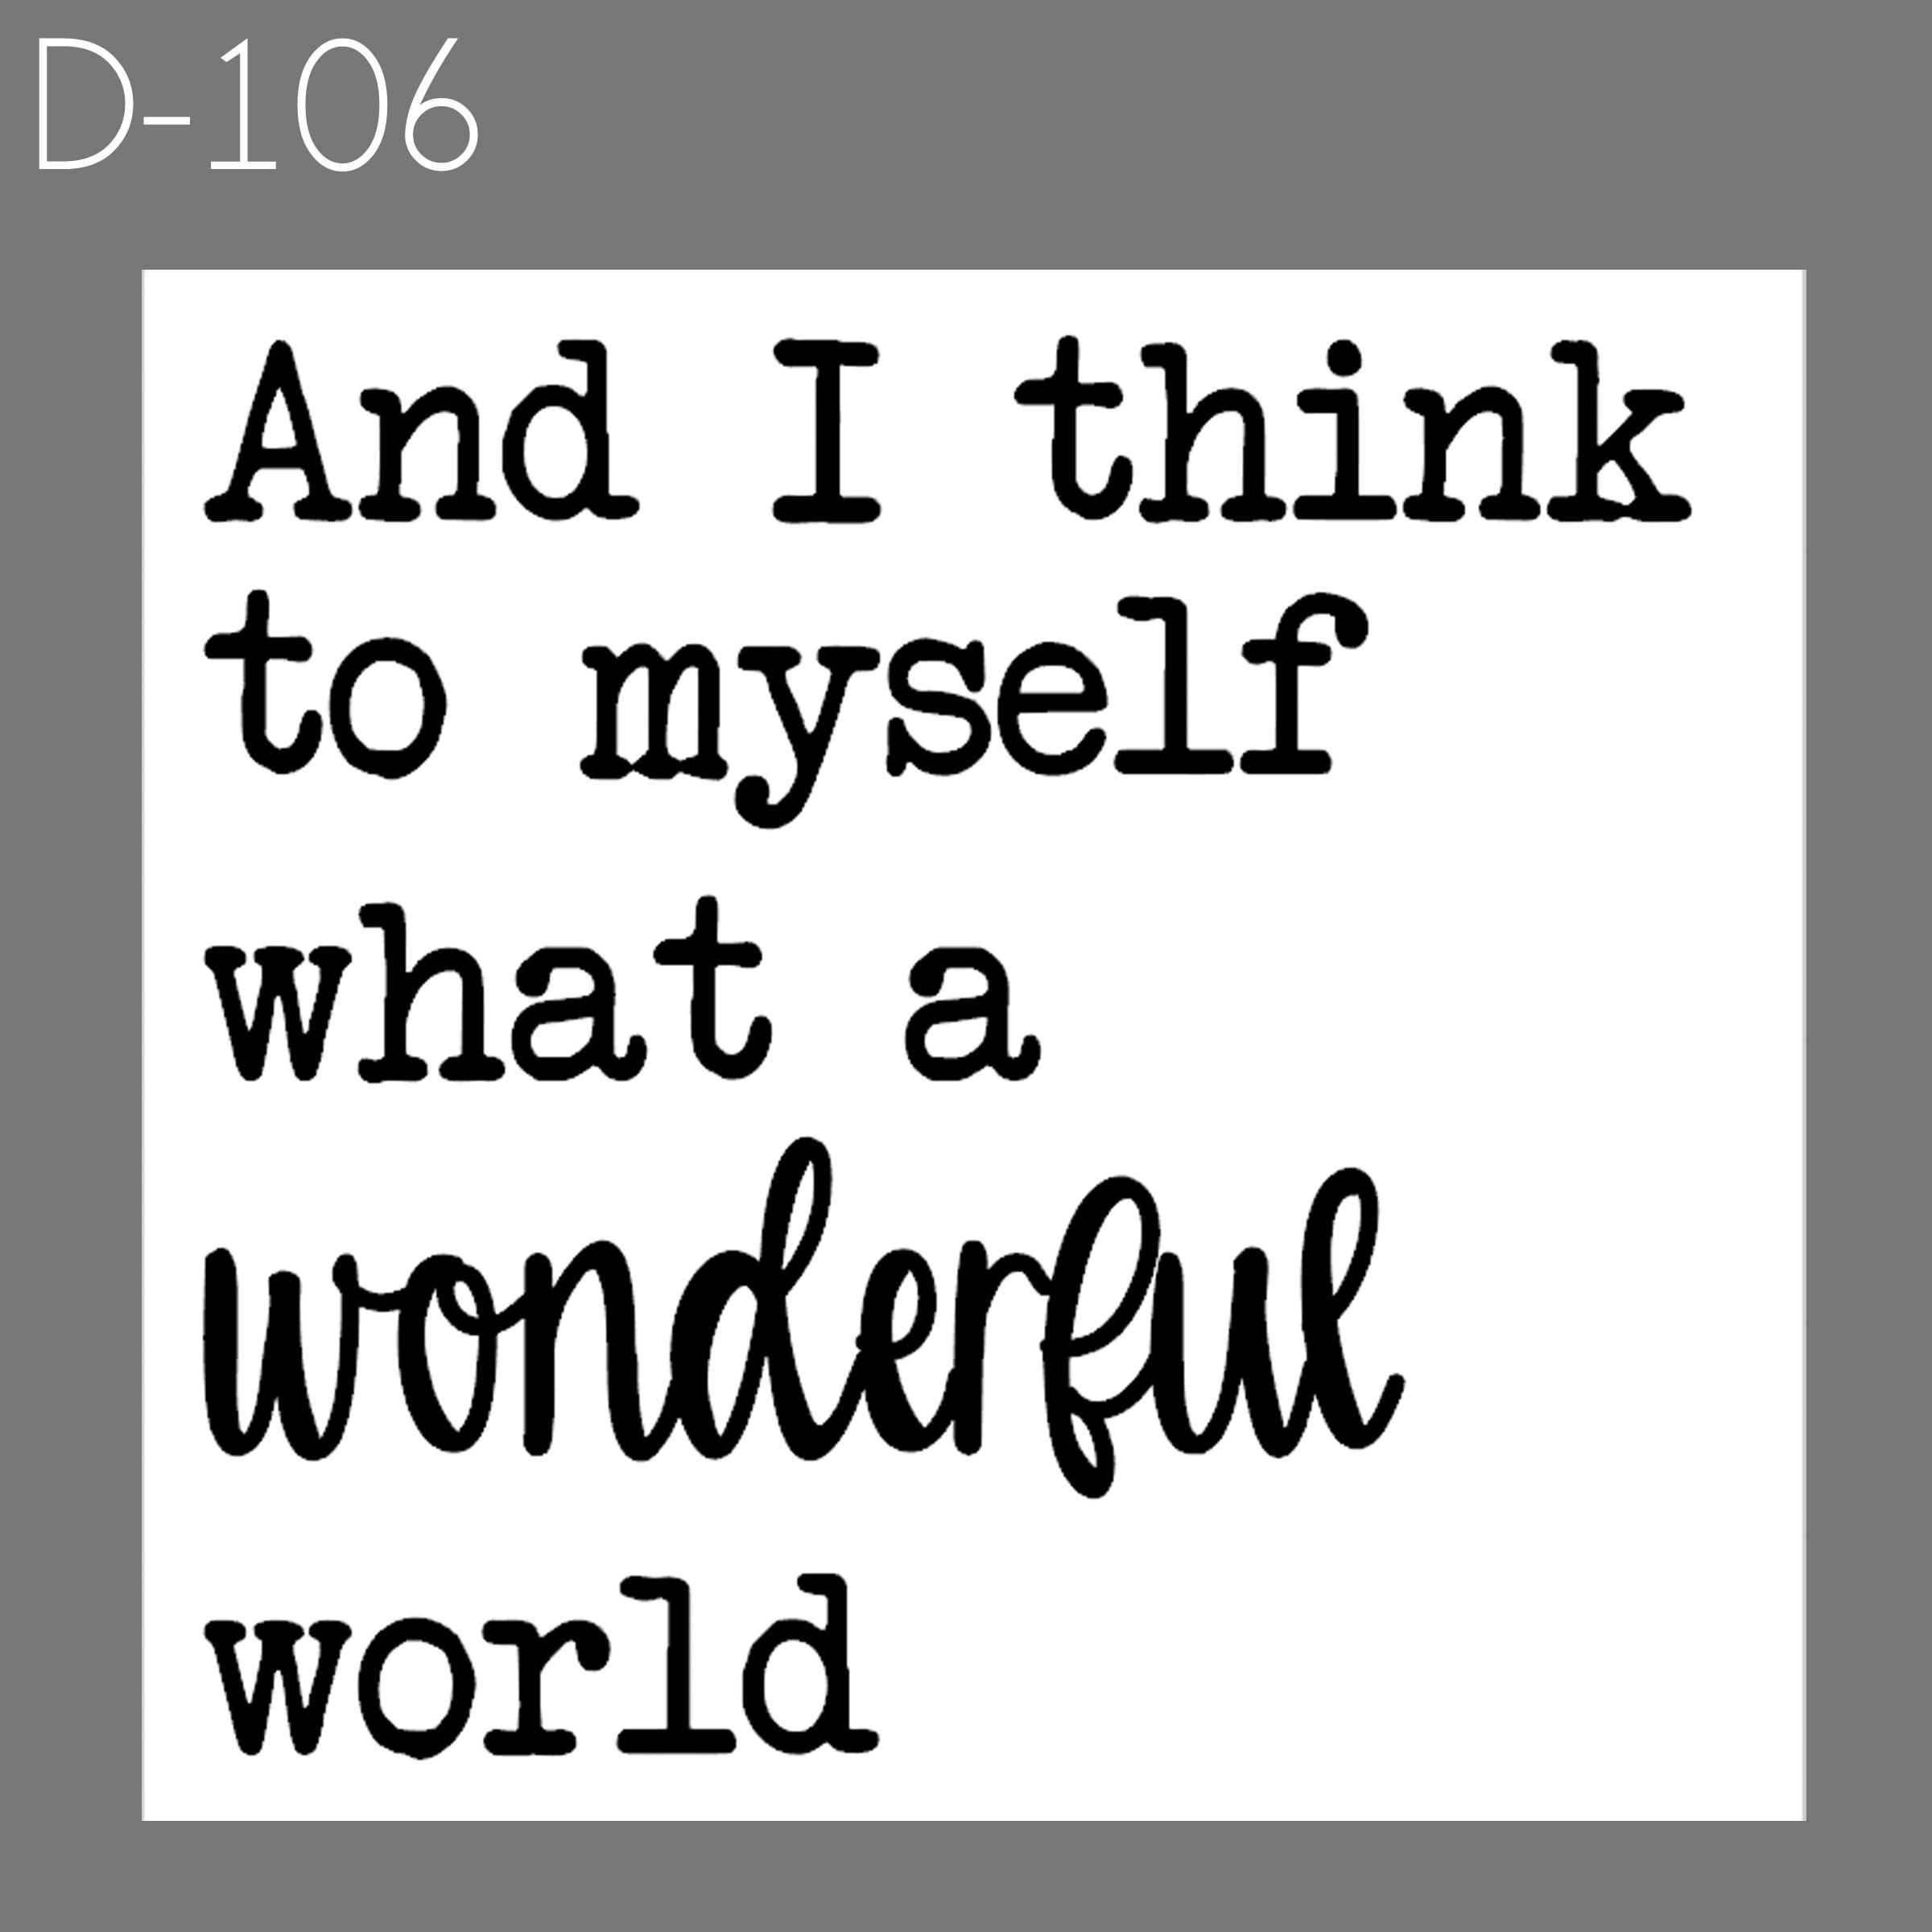 Wonderful World   $30